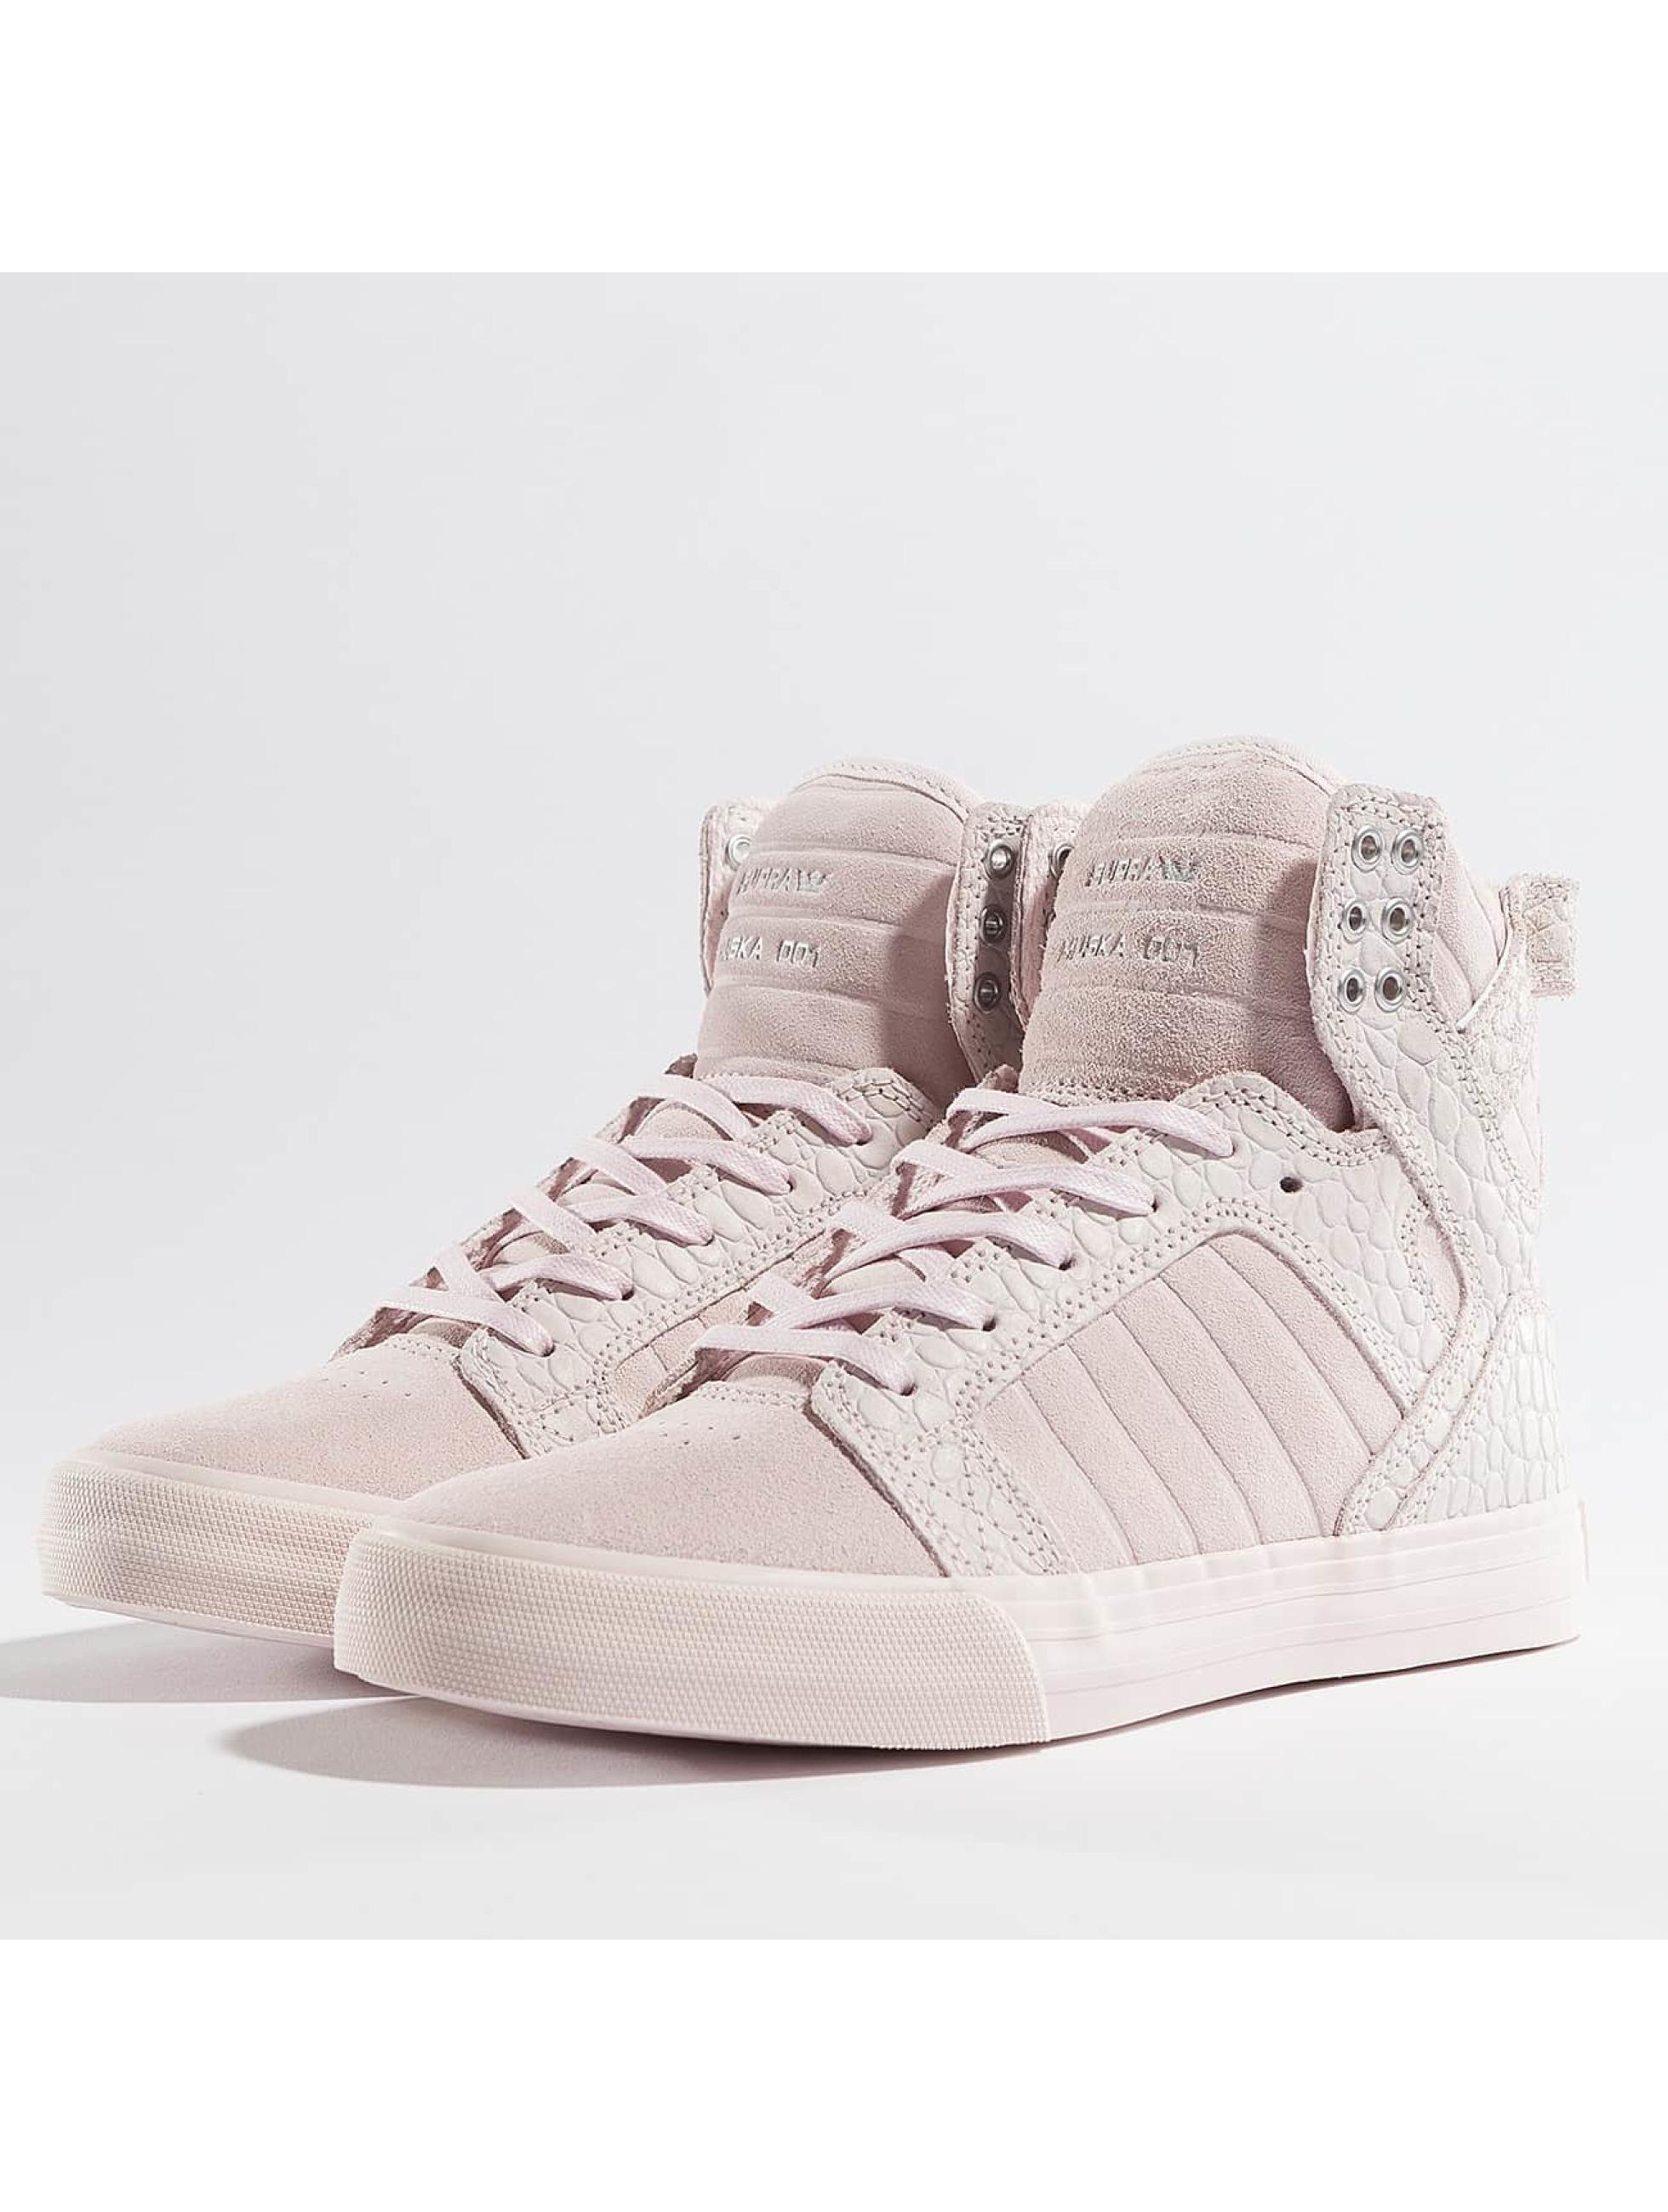 Supra Frauen Sneaker Skytop in rosa